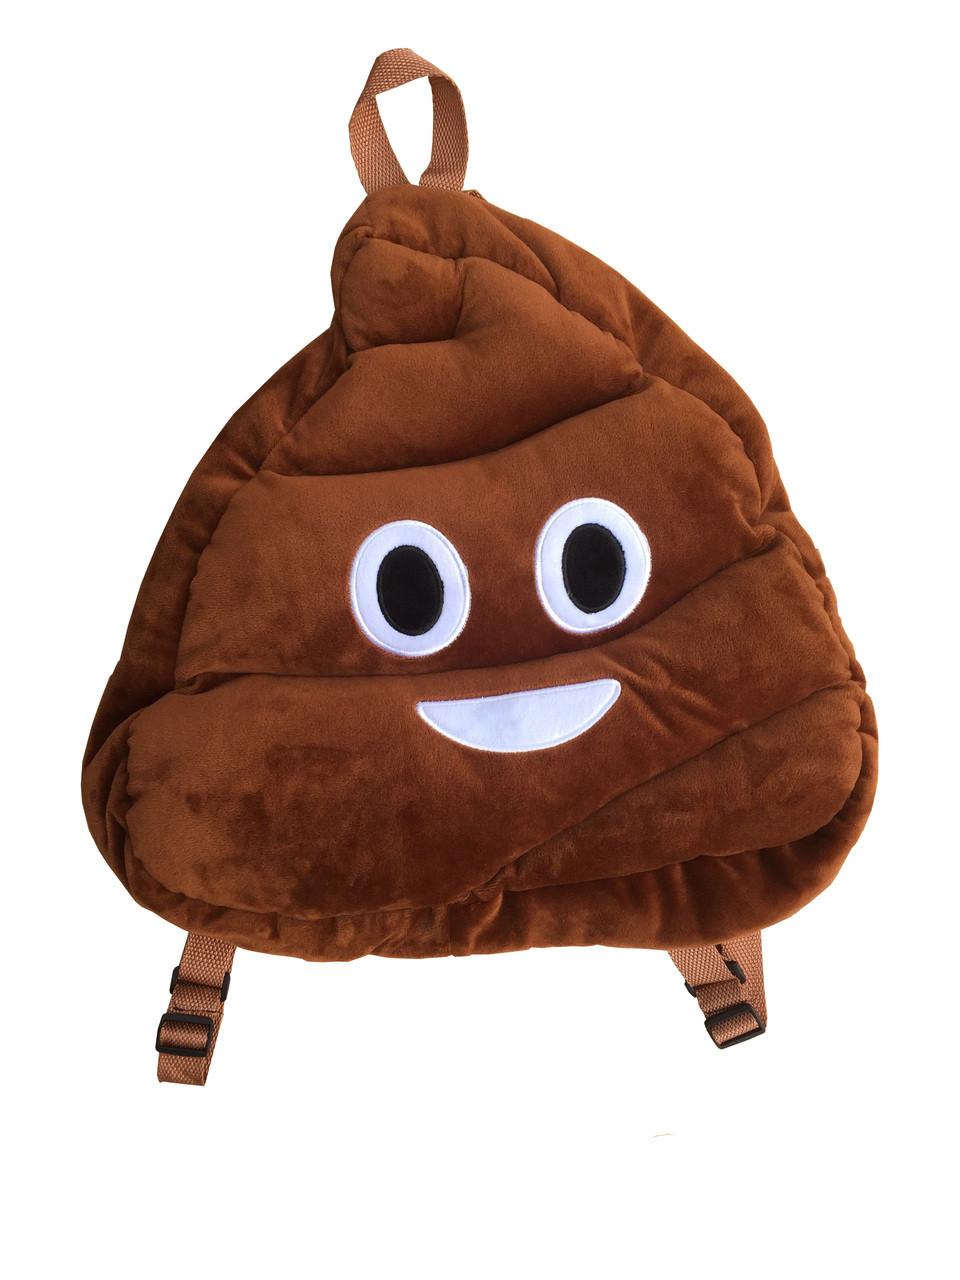 Emoticon Emoji Plush Backpack School Bag